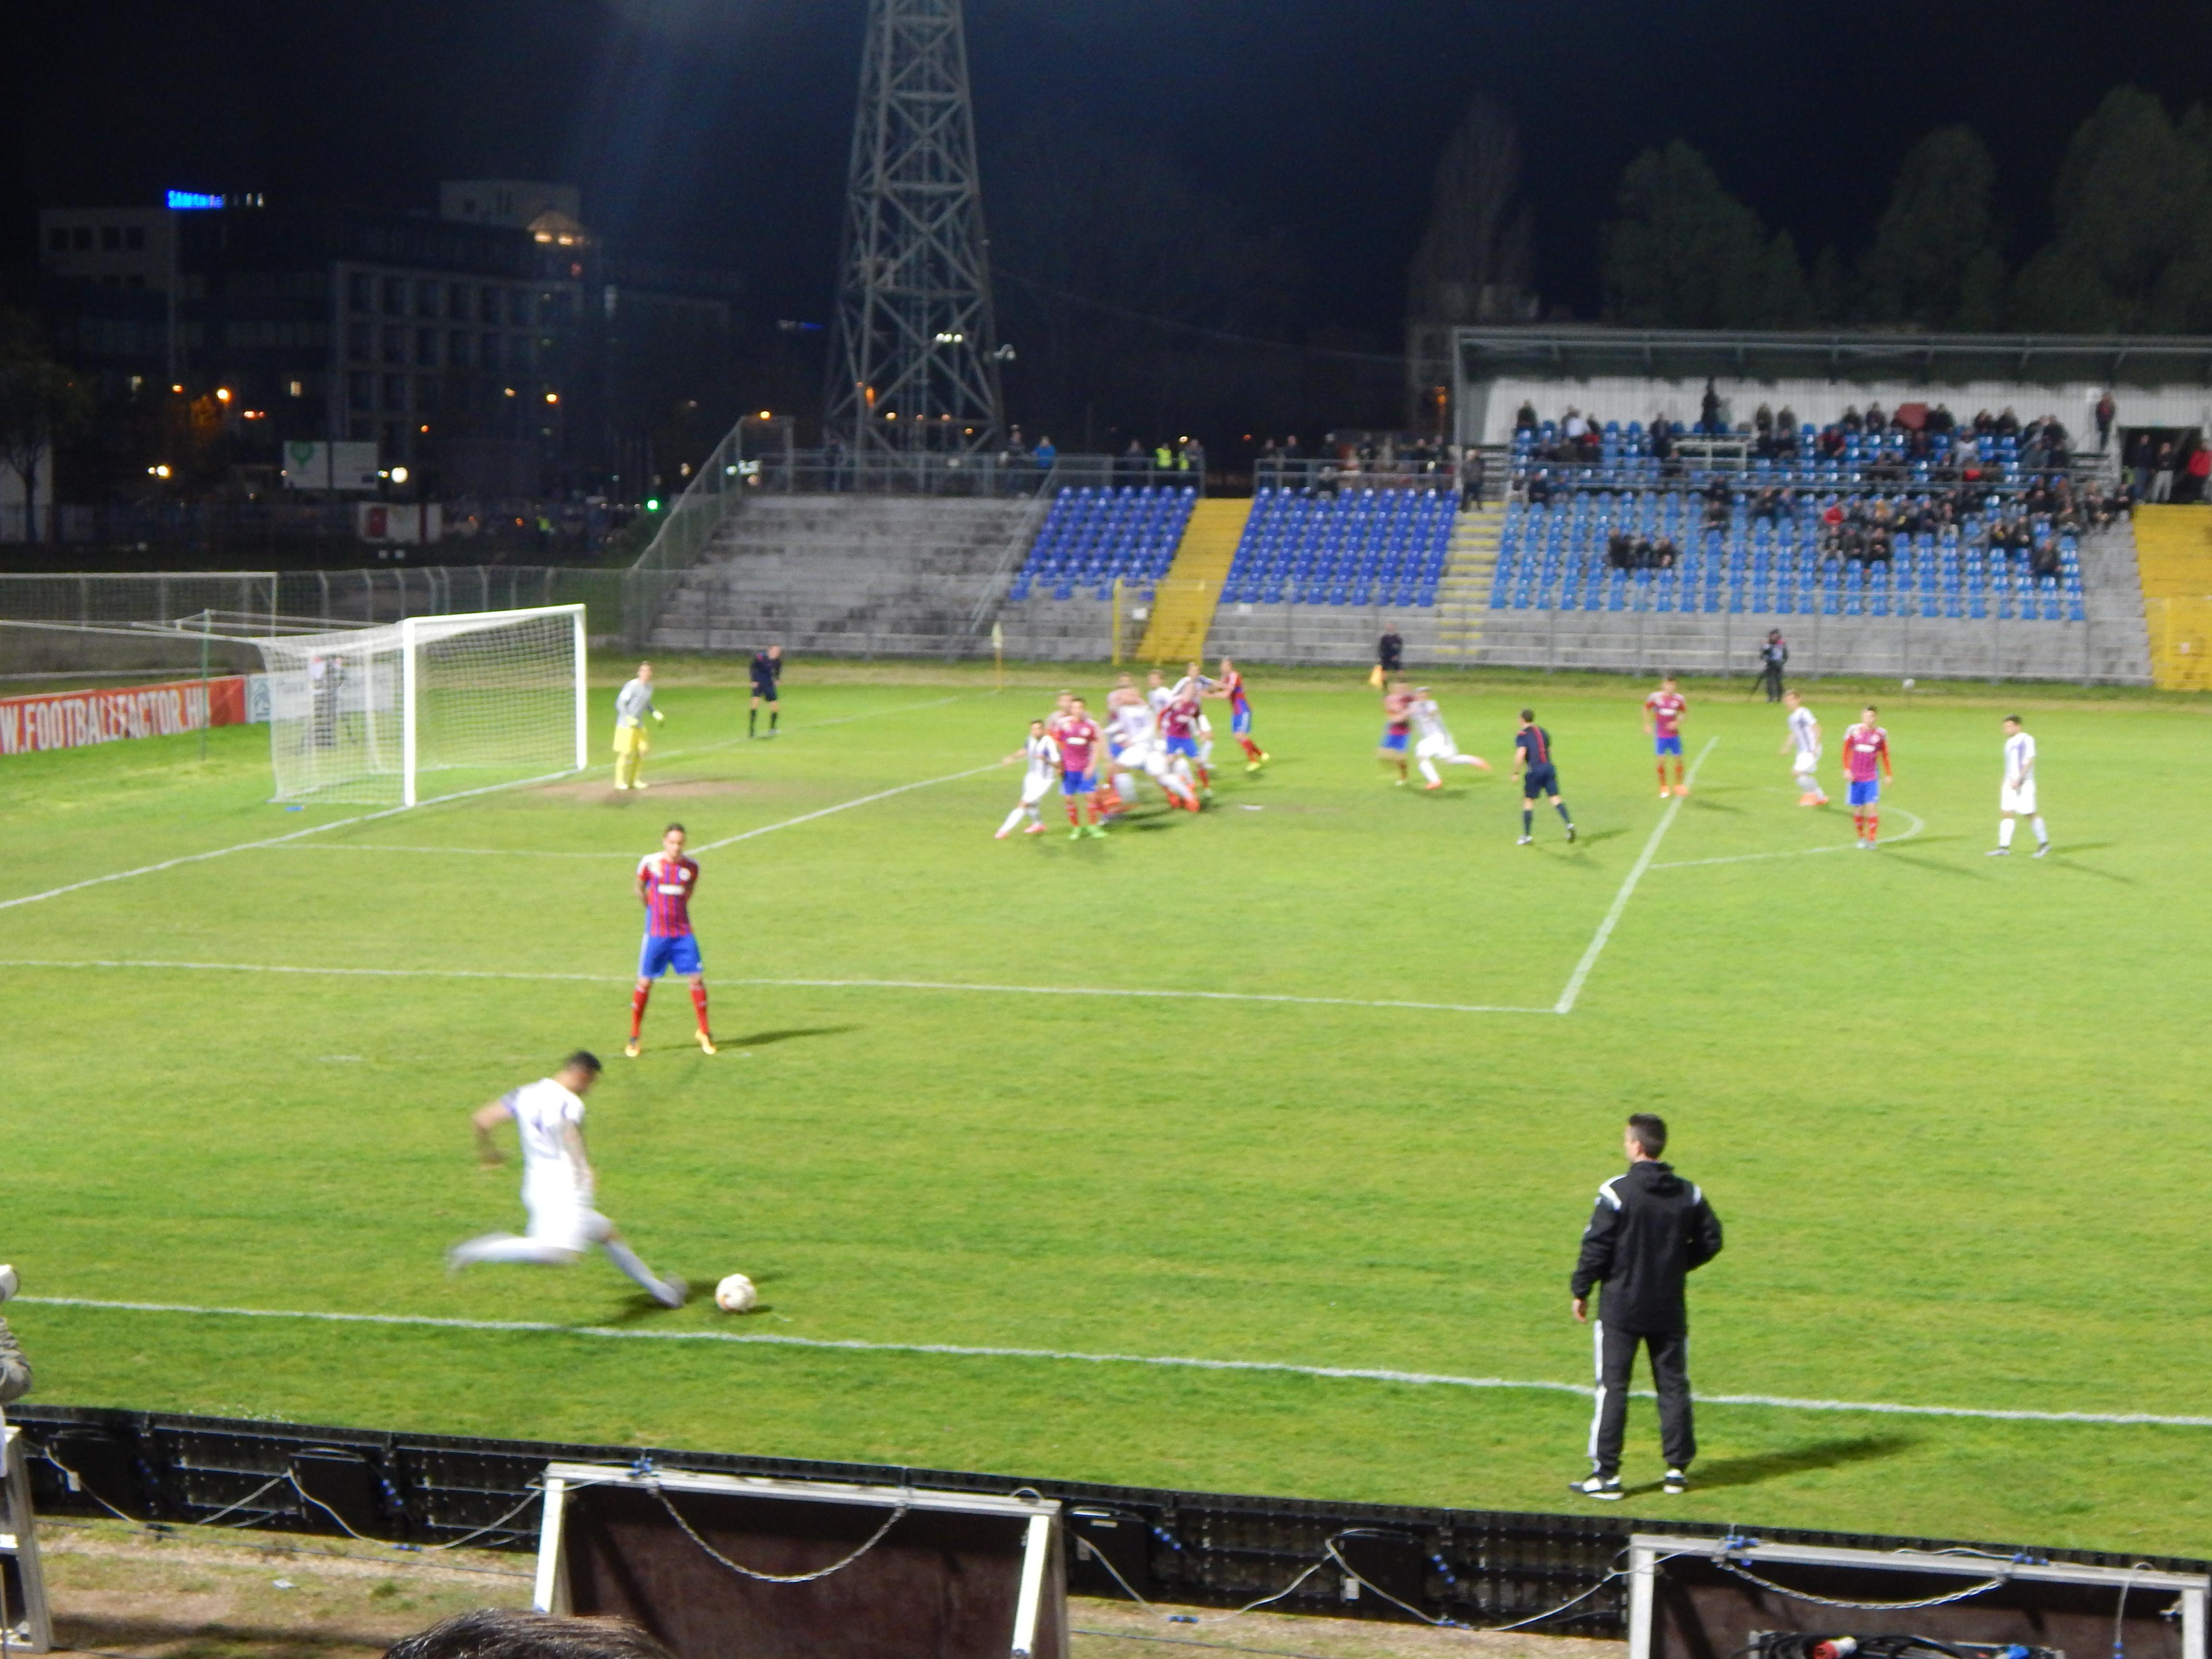 Vasas-Újpest 3-2 / Fotó: Krisz / mndnhl.blog.hu